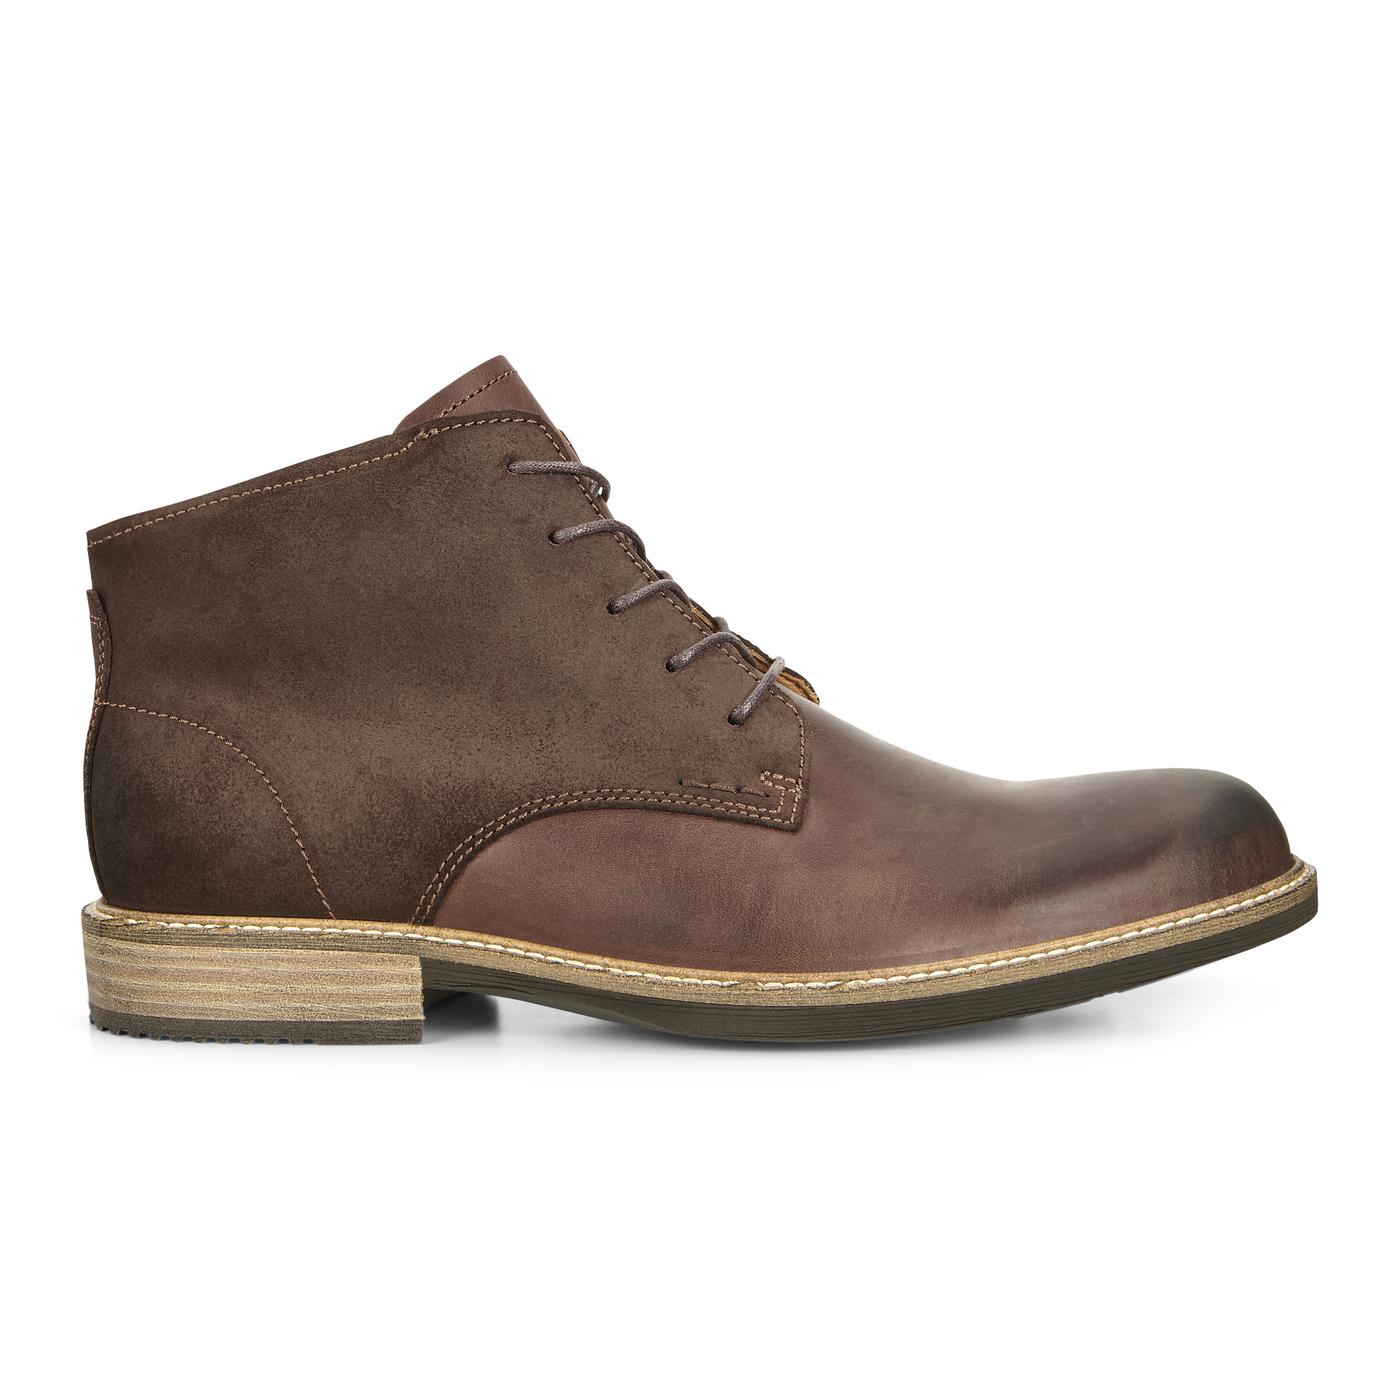 ECCO Kenton Plain Toe Boot